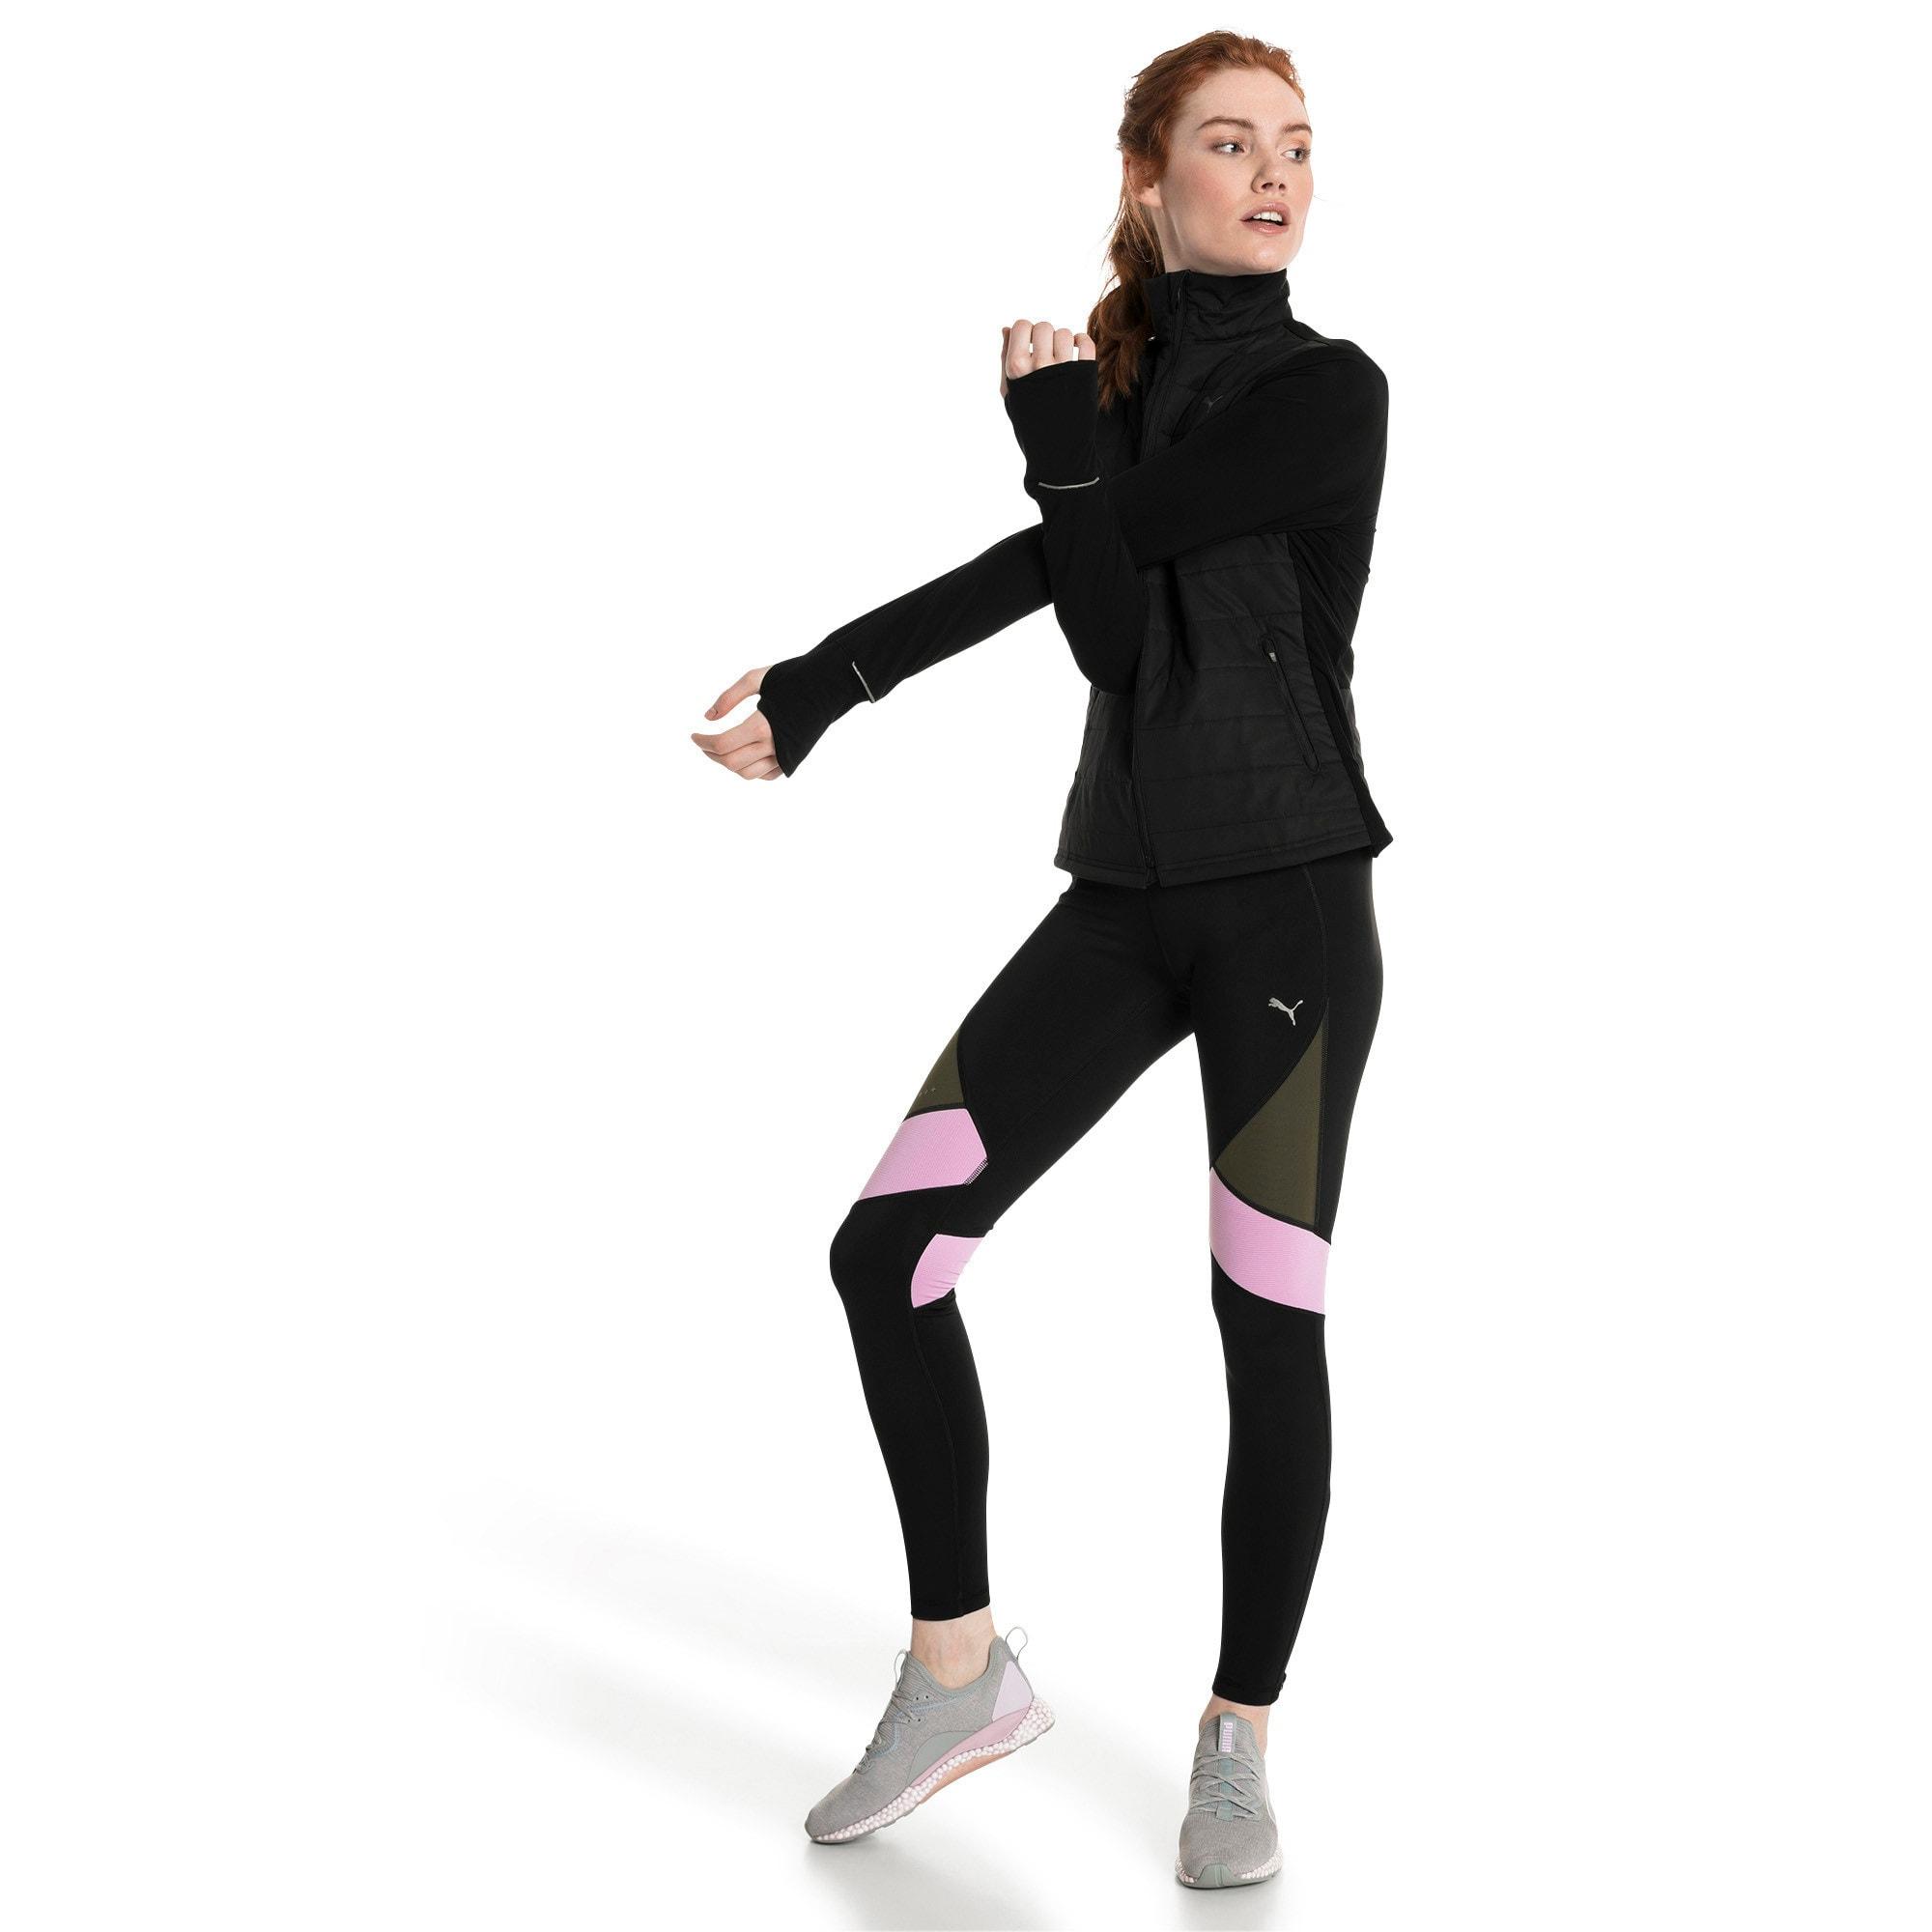 Thumbnail 5 of IGNITE Women's Running Tights, Black-Forest Night-Orchid, medium